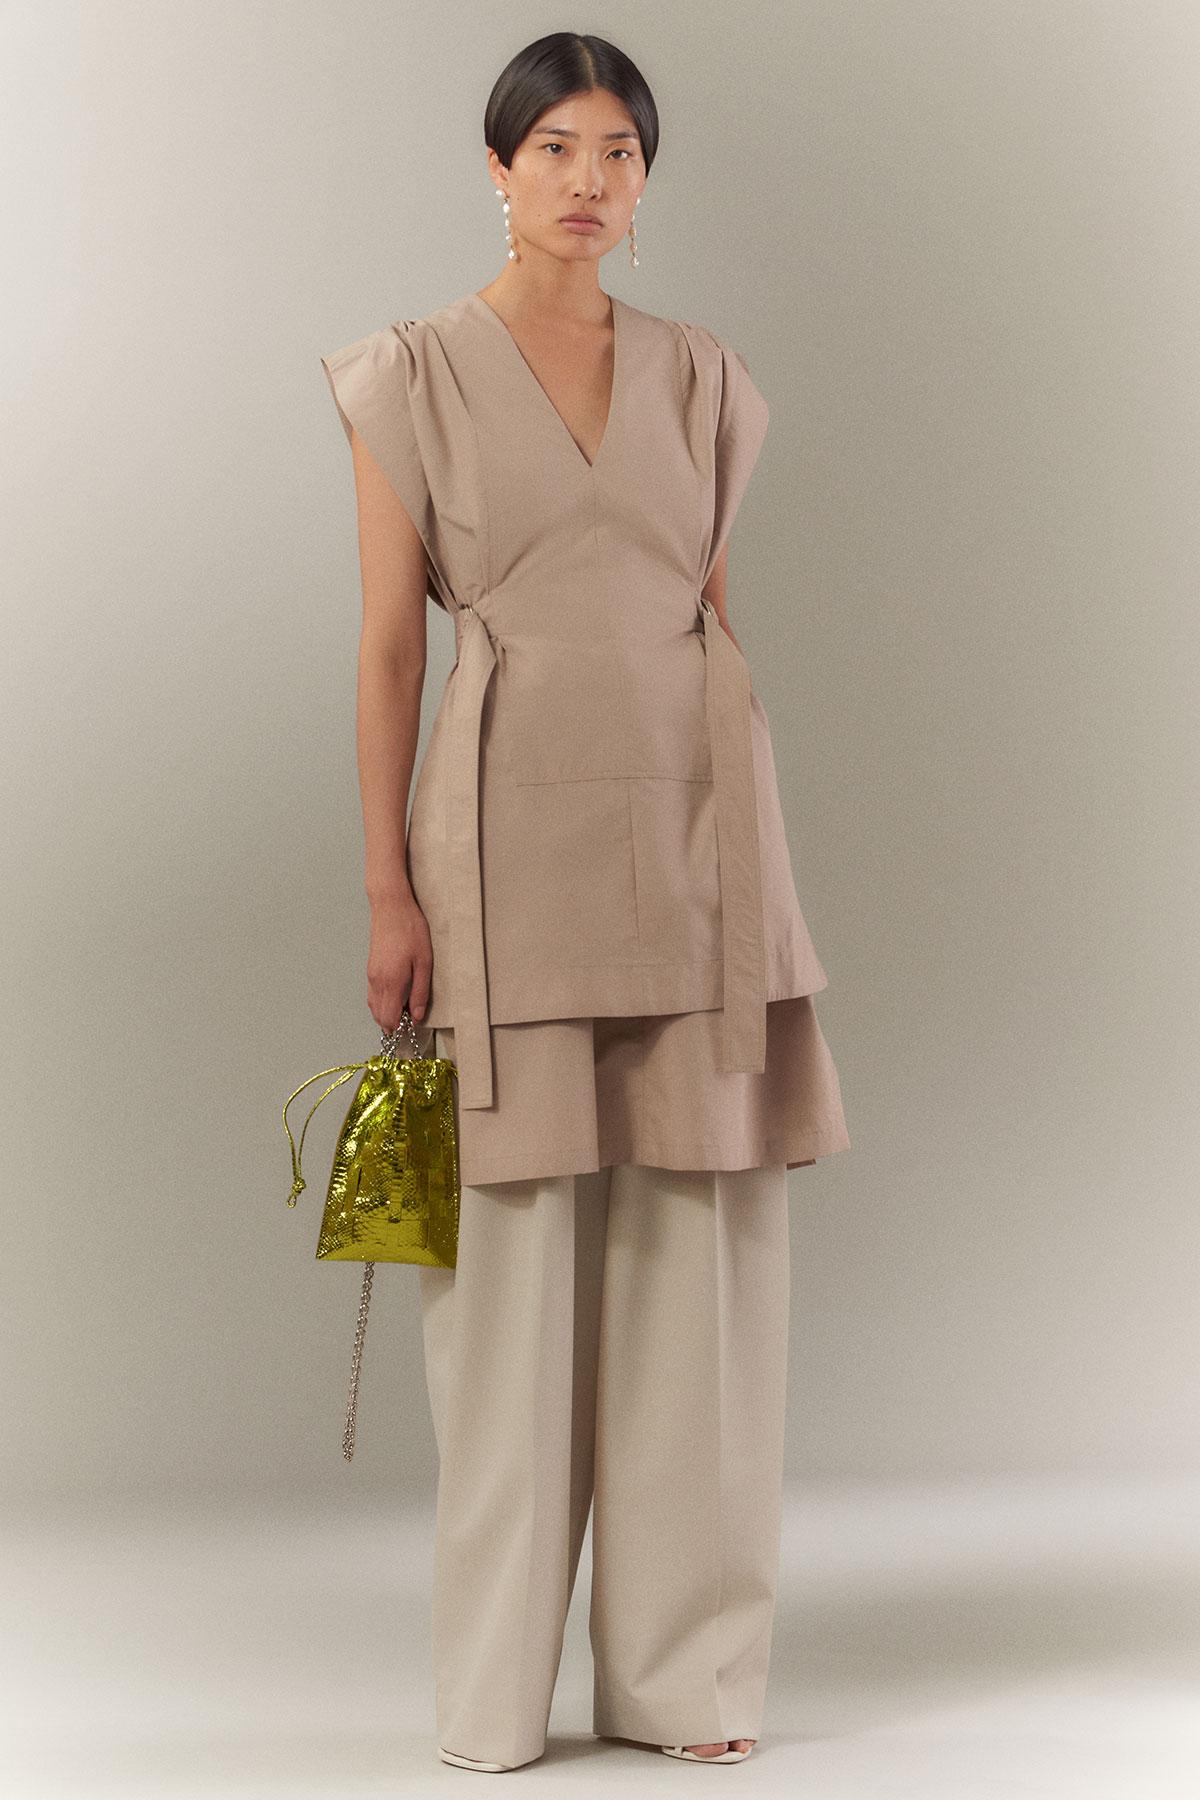 3.1 Phillip Lim Spring/Summer 2022 Collection